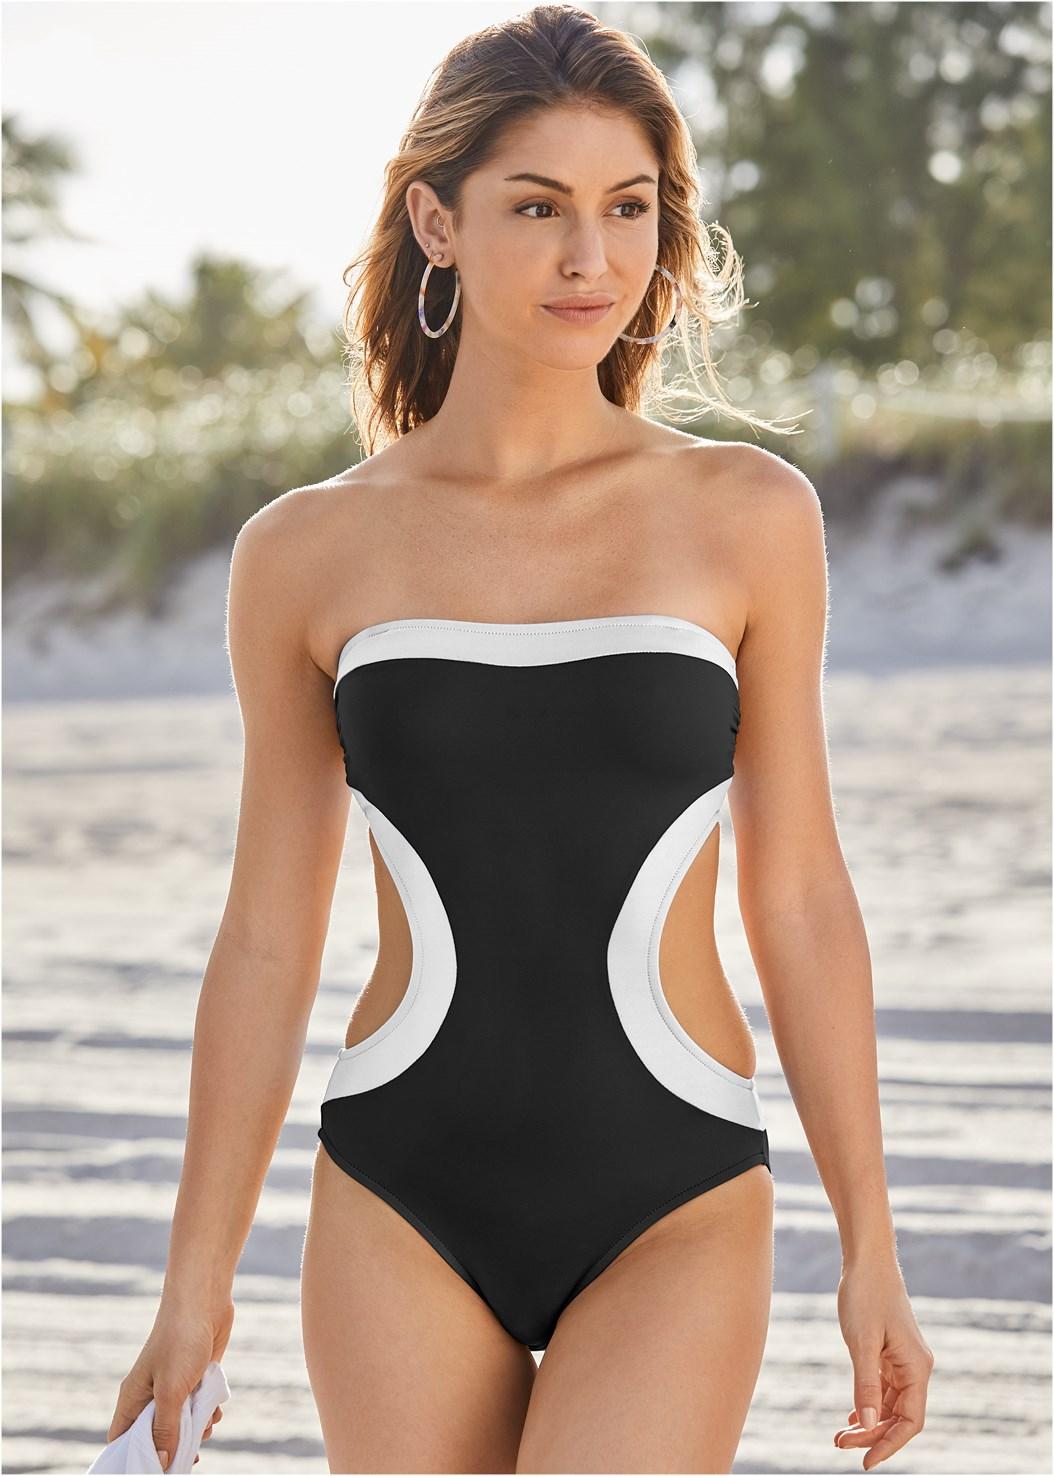 Bandeau Monokini,Mesh Dress/Skirt